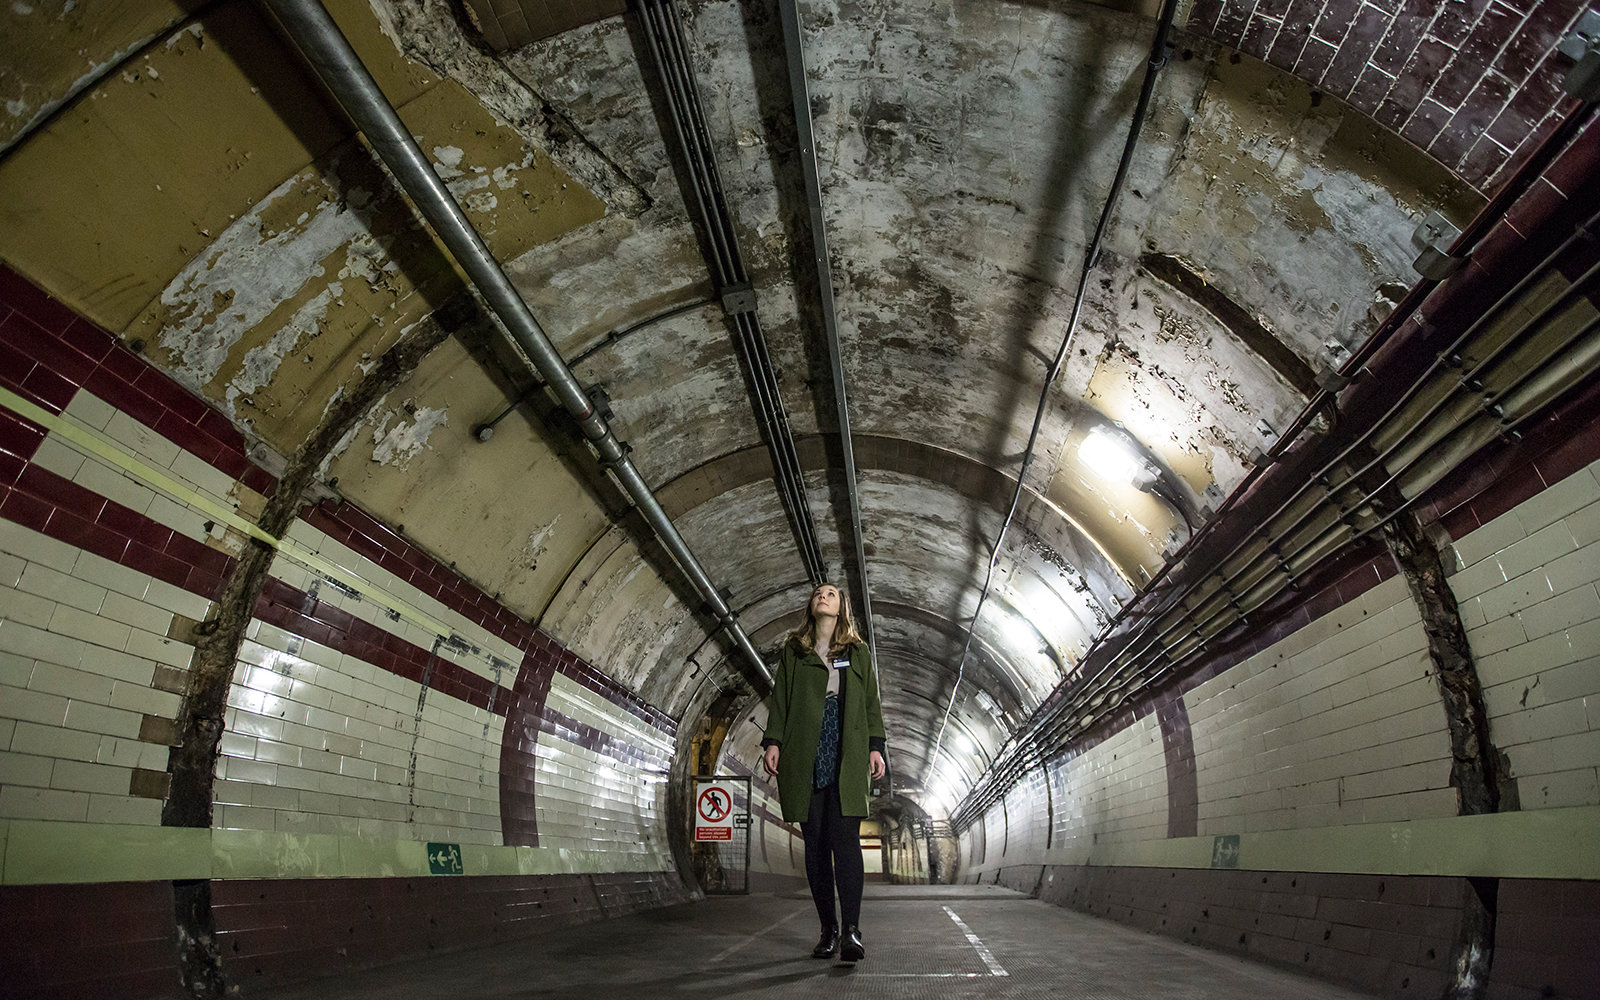 Winston Churchill Underground Bunker Tour